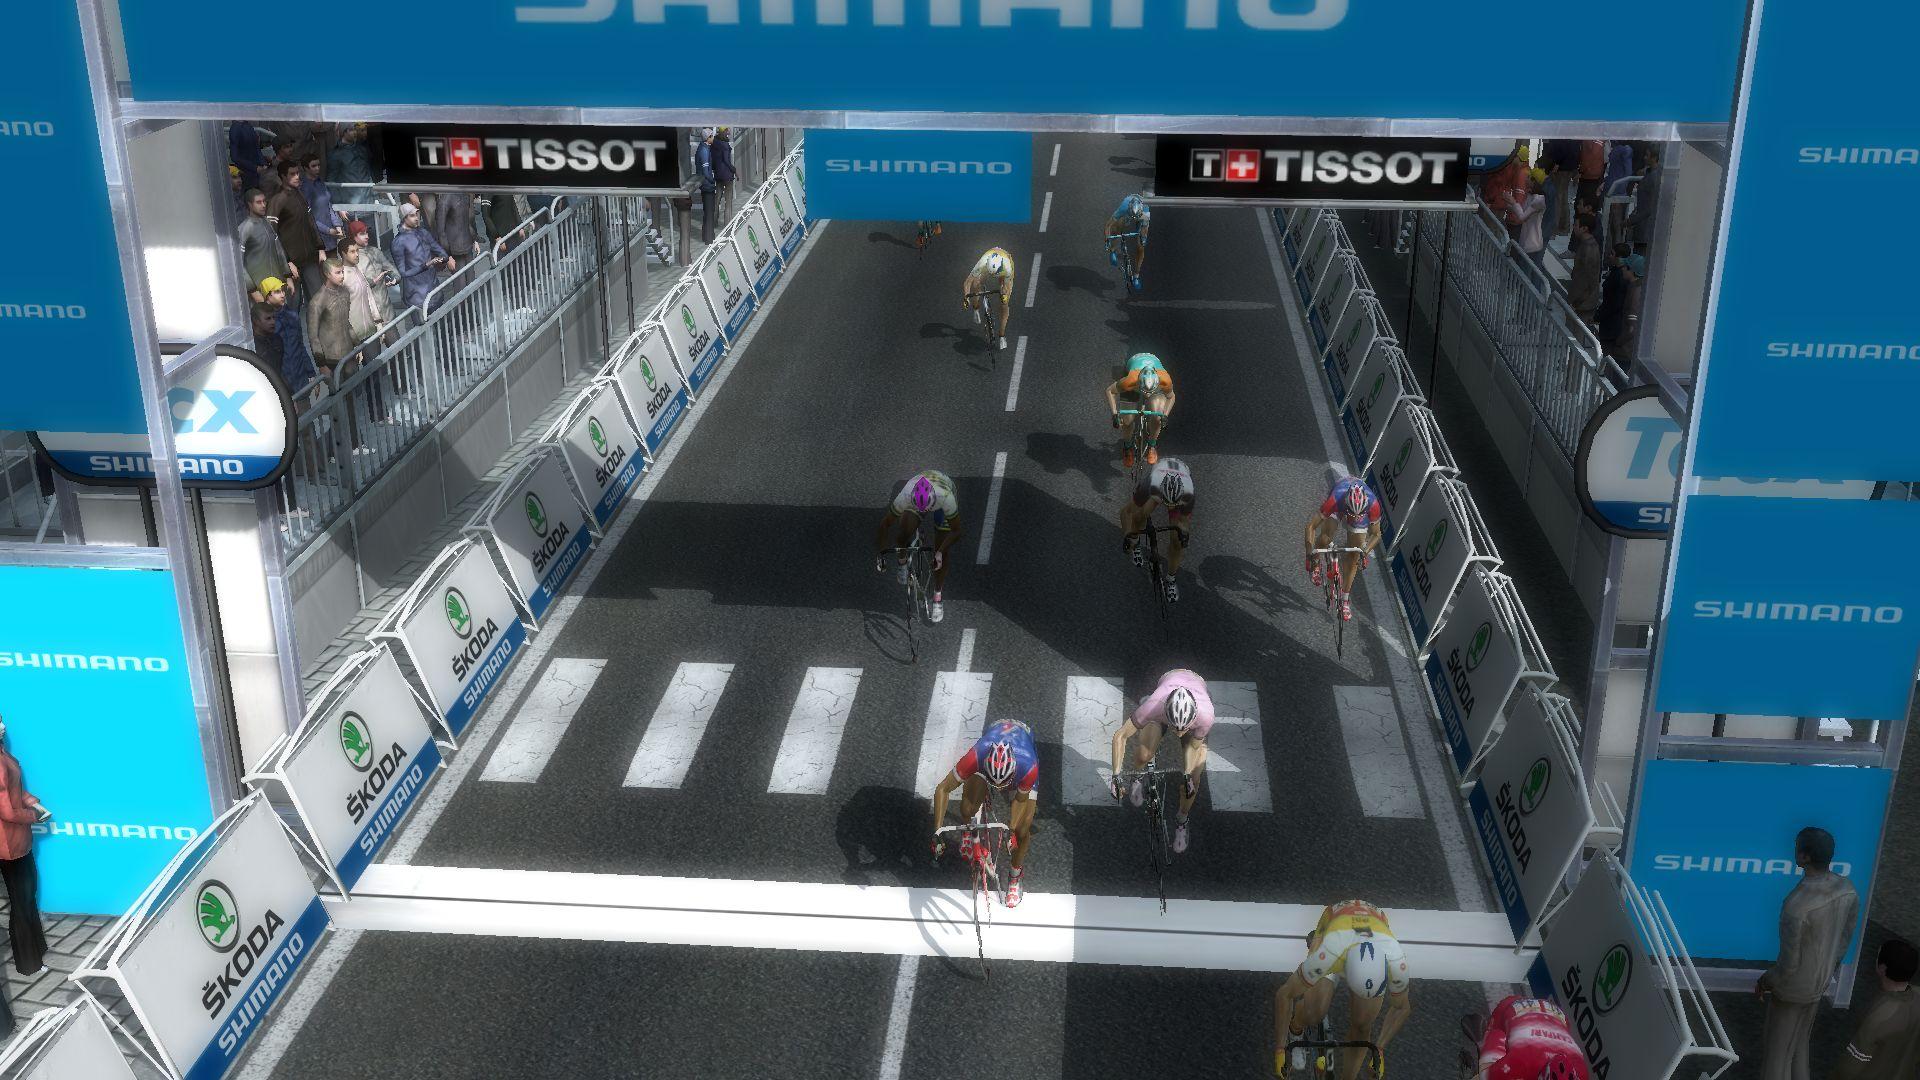 pcmdaily.com/images/mg/2018/Races/C2/Lillestrom/LGP%2024.jpg